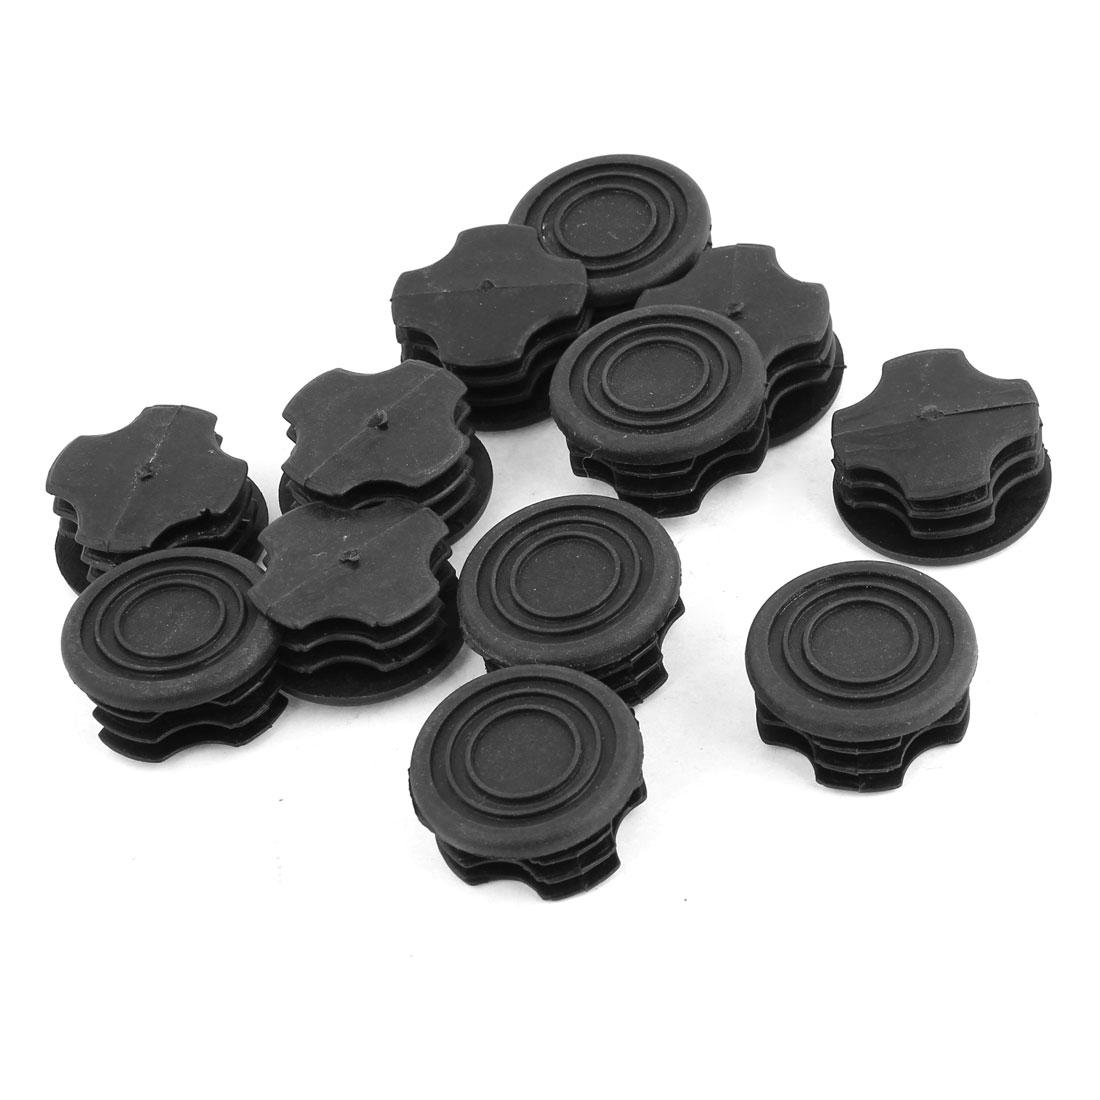 12 Pcs Black Plastic 32mm Dia Round Tubing Tube Insert Caps Covers